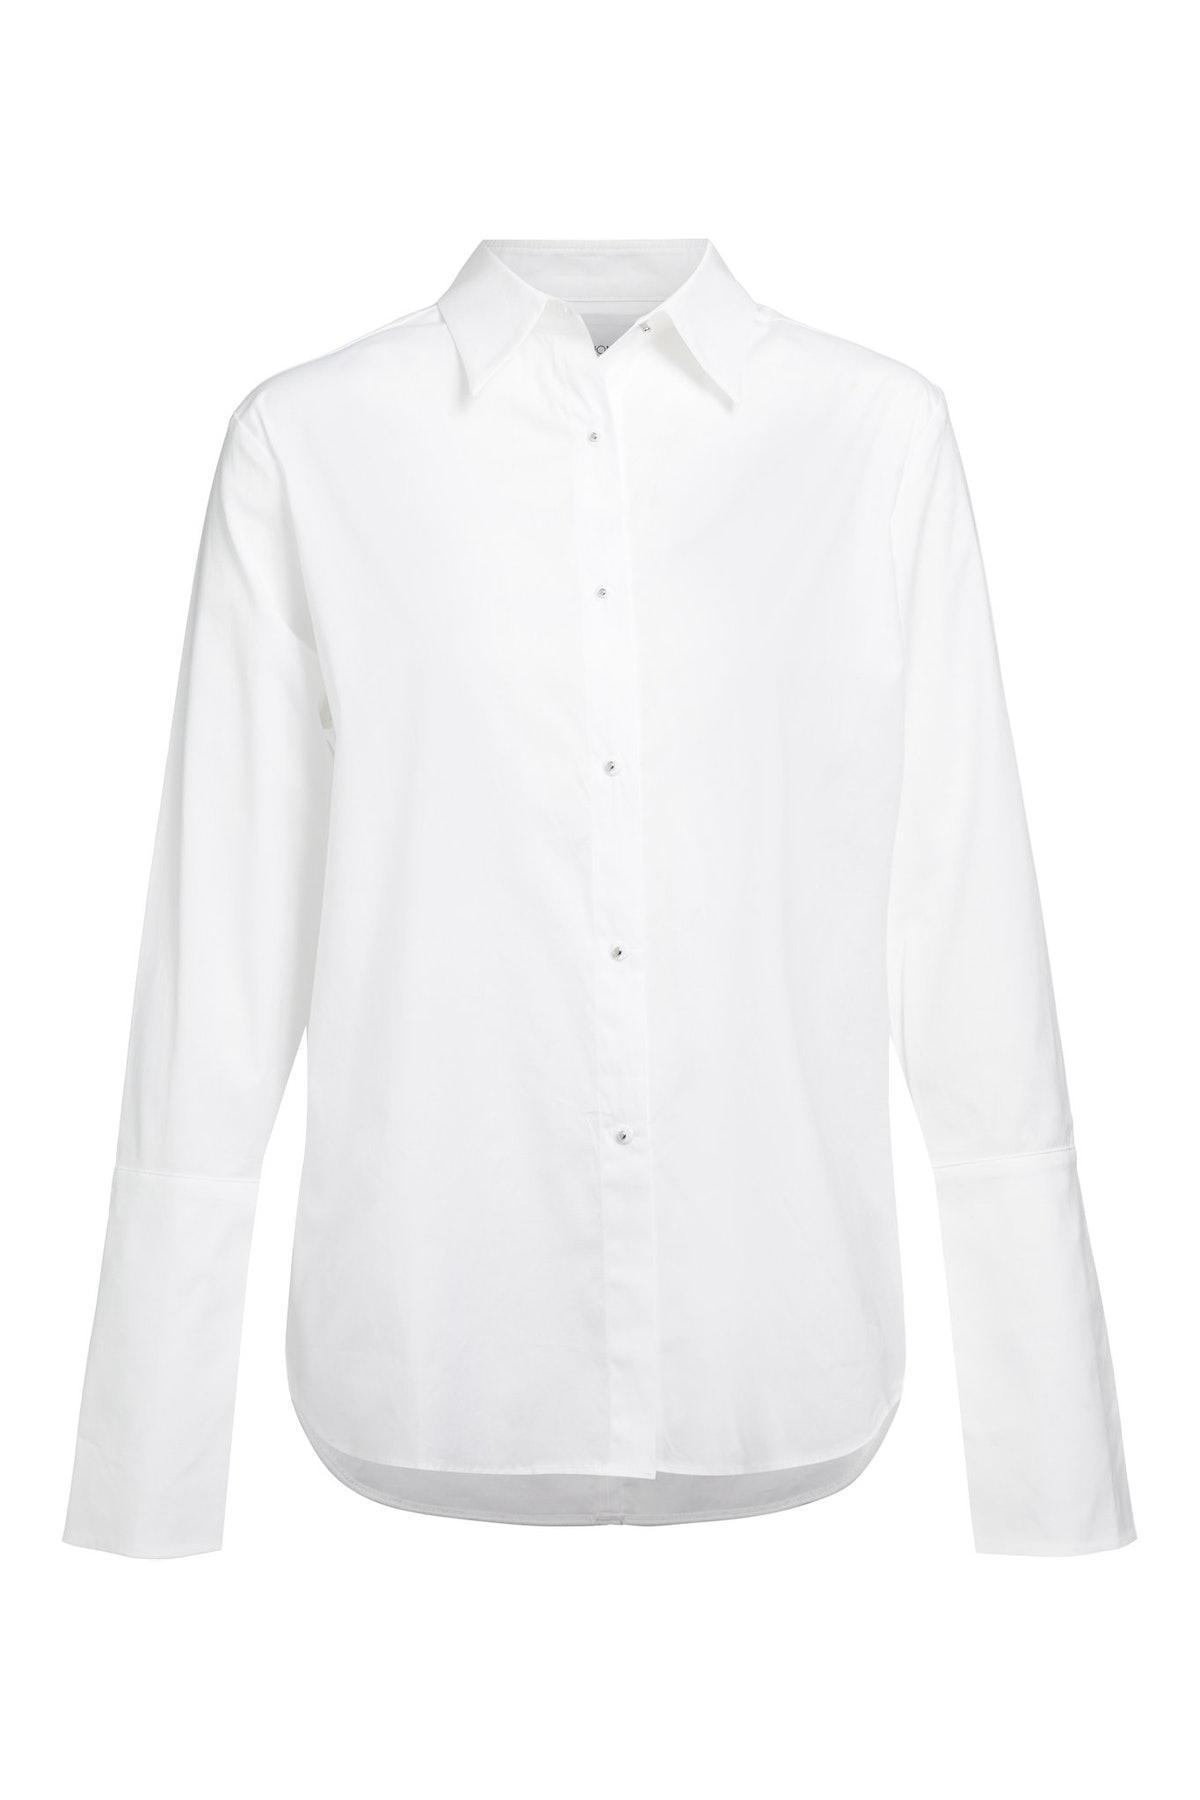 The Husband Shirt